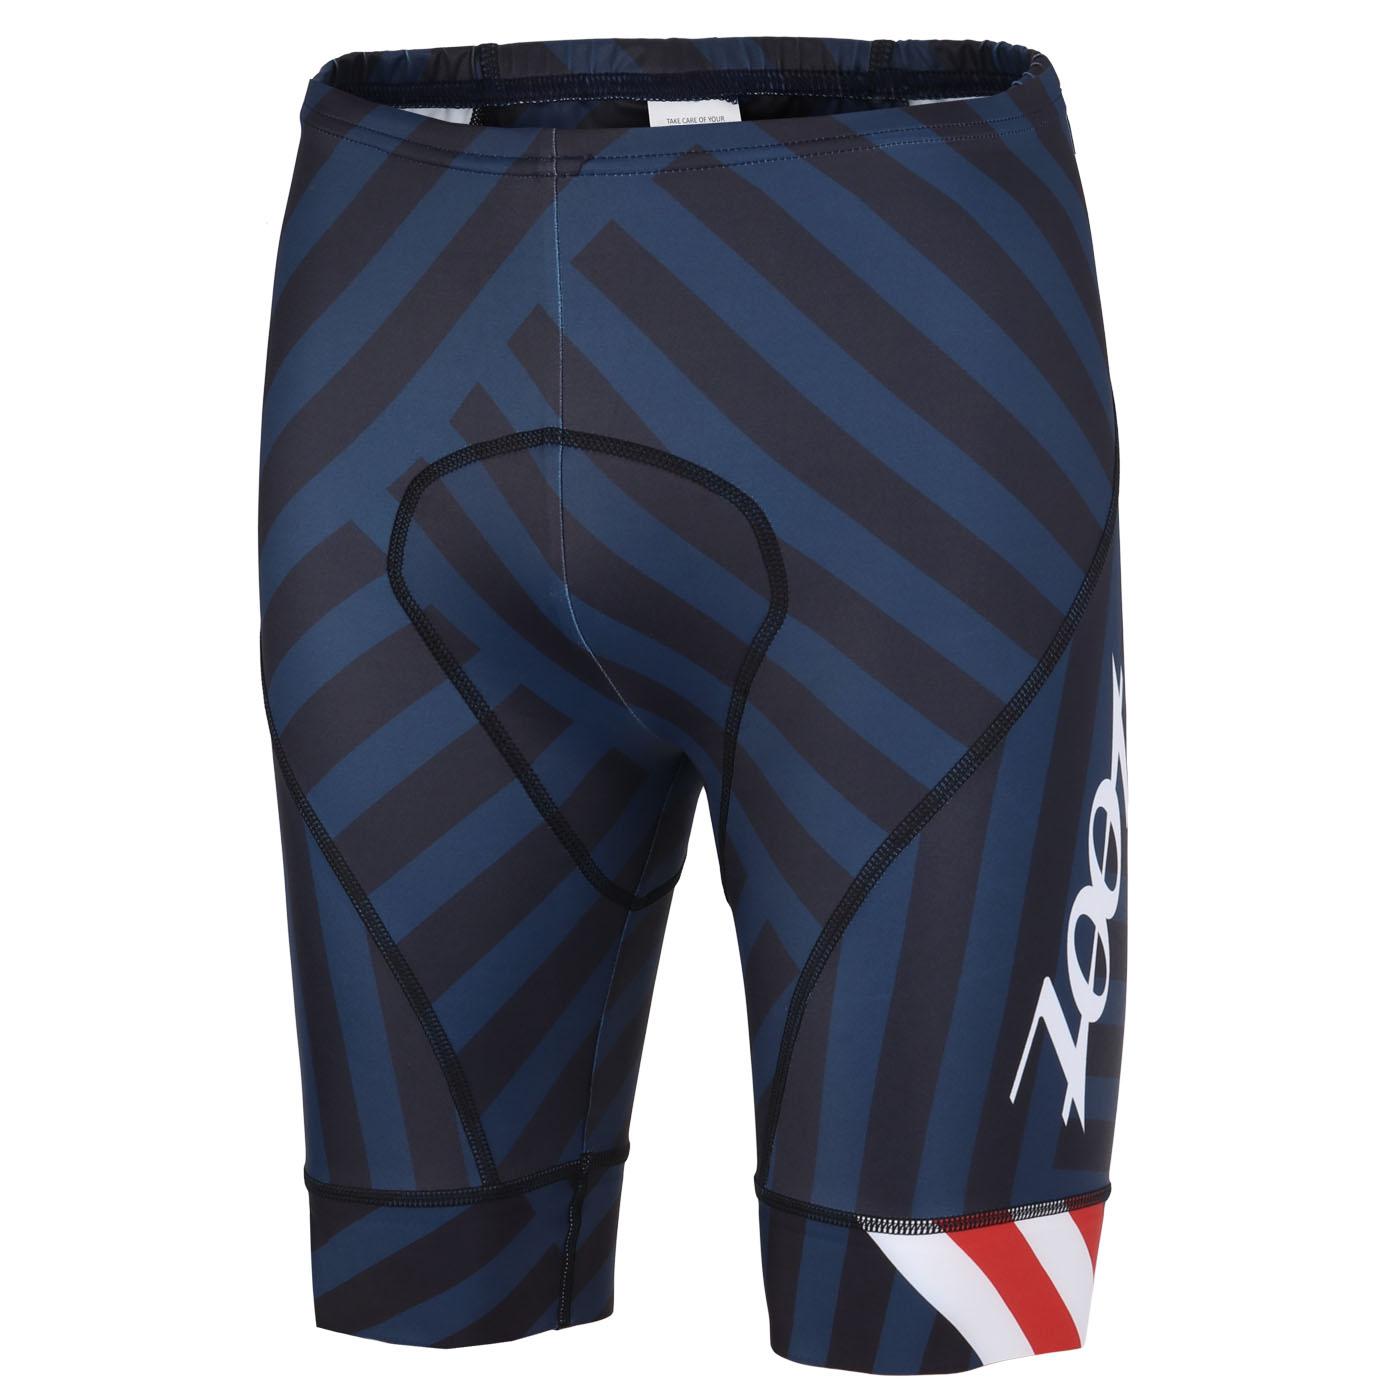 ZOOT LTD Pantalones cortos para bicicleta de carretera para hombres - riviera